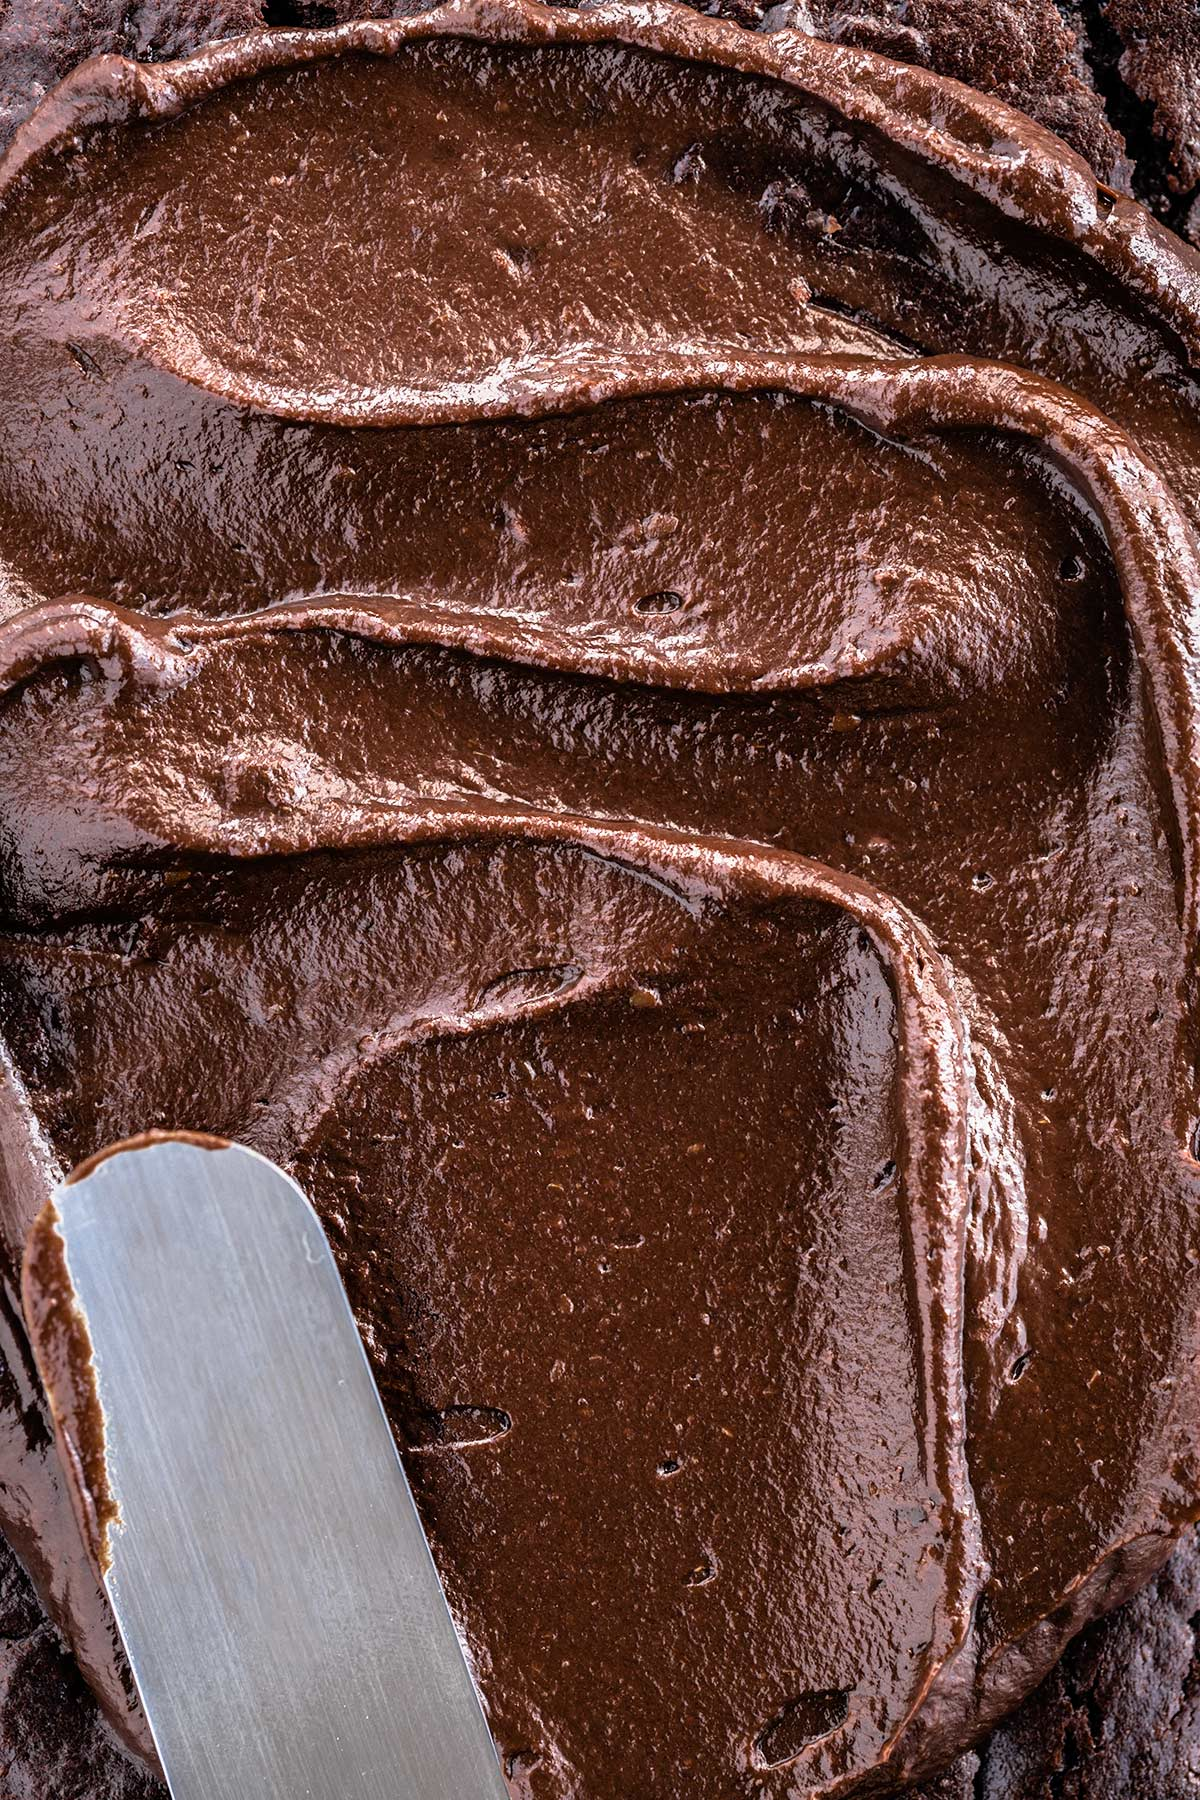 healthy VEGAN GLUTENFREE BROWNIE recipe with espresso coffee and coconut milk ricetta BROWNIES VEGAN SENZA GLUTINE facili light sani senza farine raffinate senza zuccheri raffinati simple